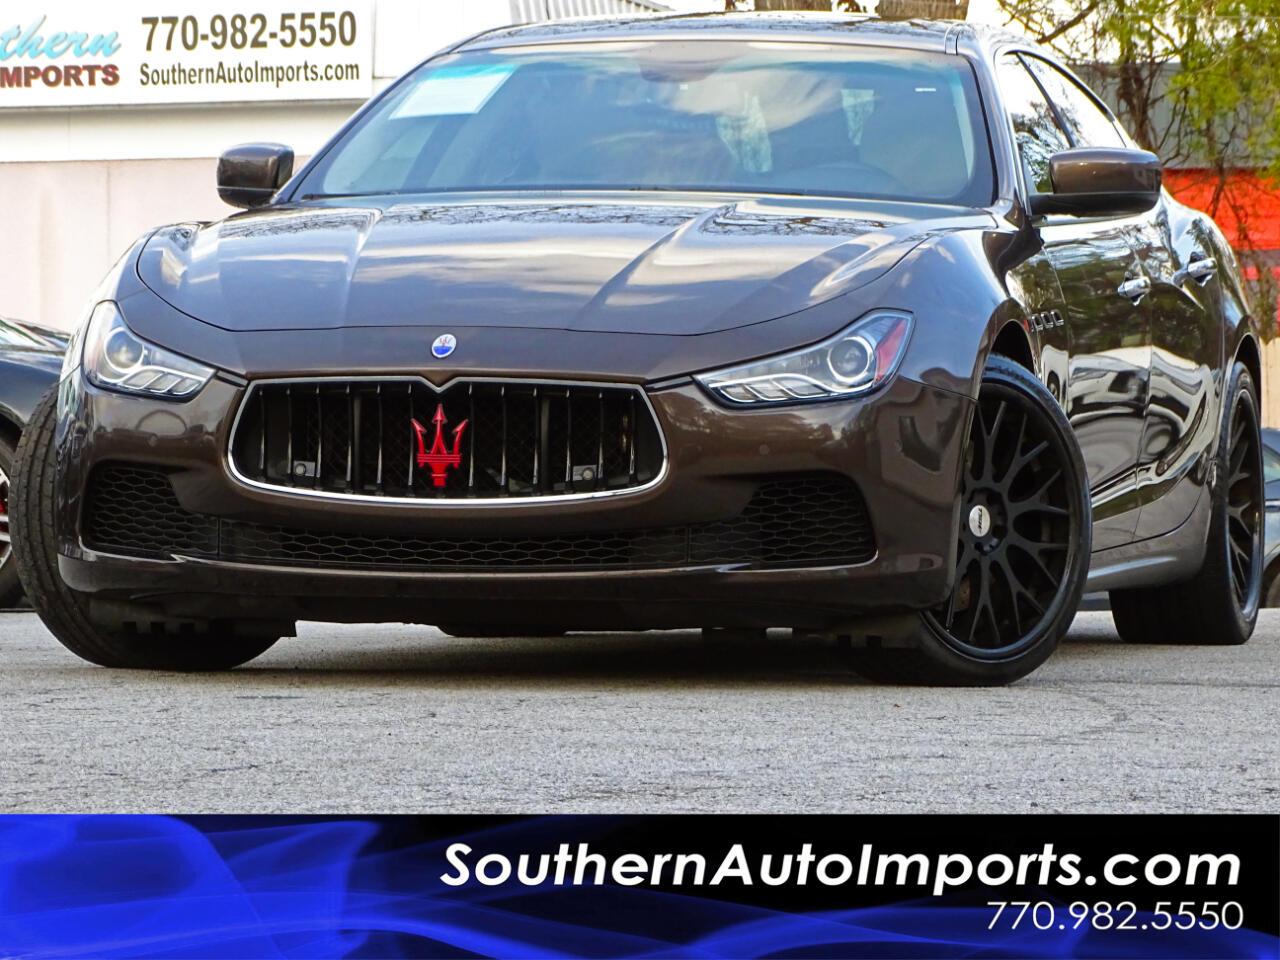 2014 Maserati Ghibli S Q4 w/Back up Camera Navigation System